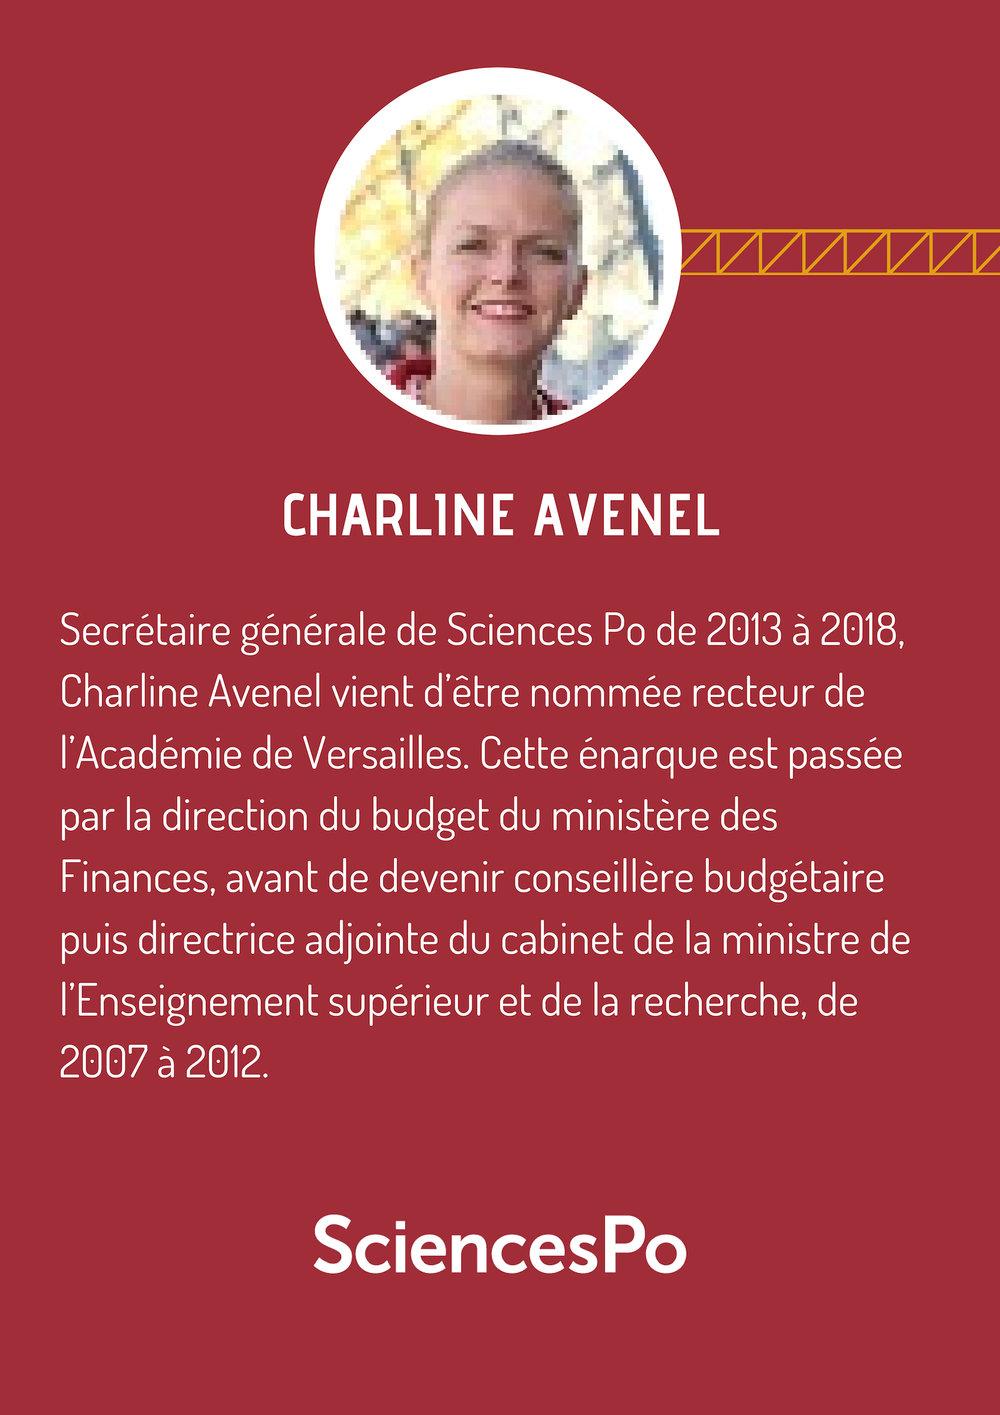 Charline Avenel